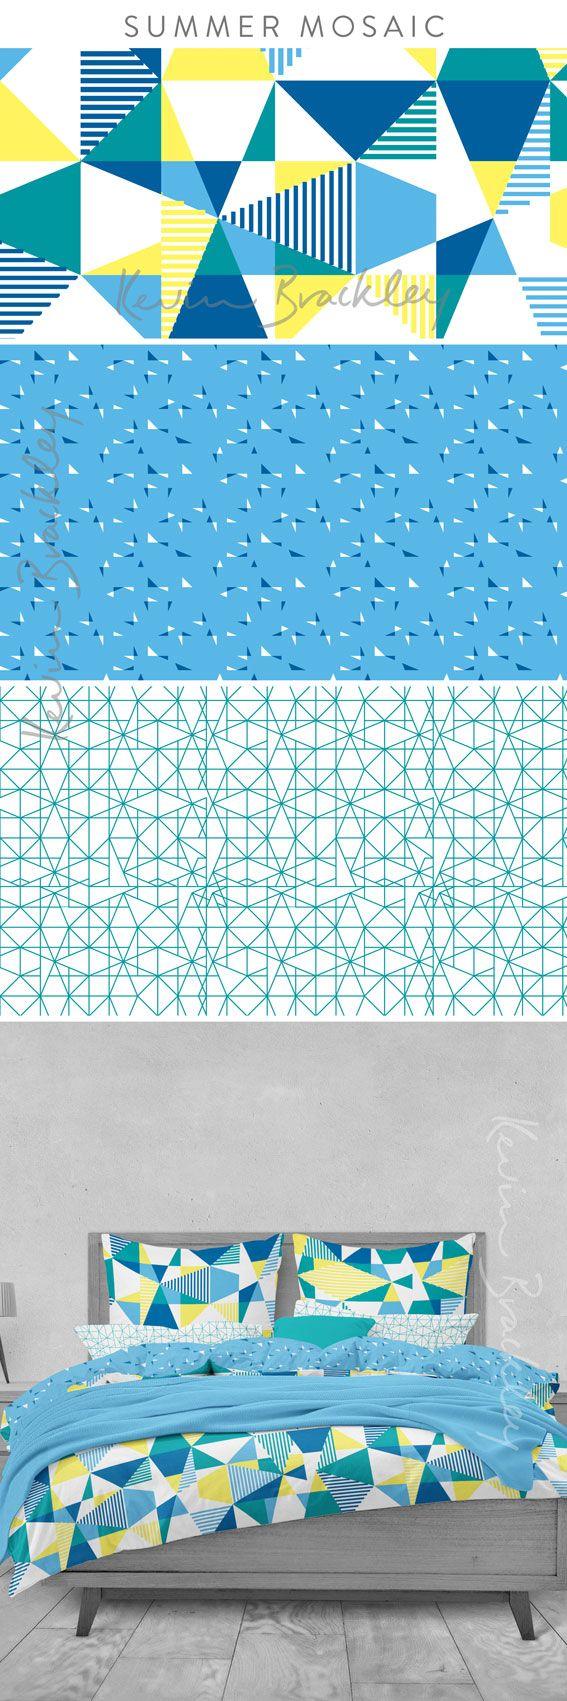 Bedding ideas in my Summer Mosaic designs